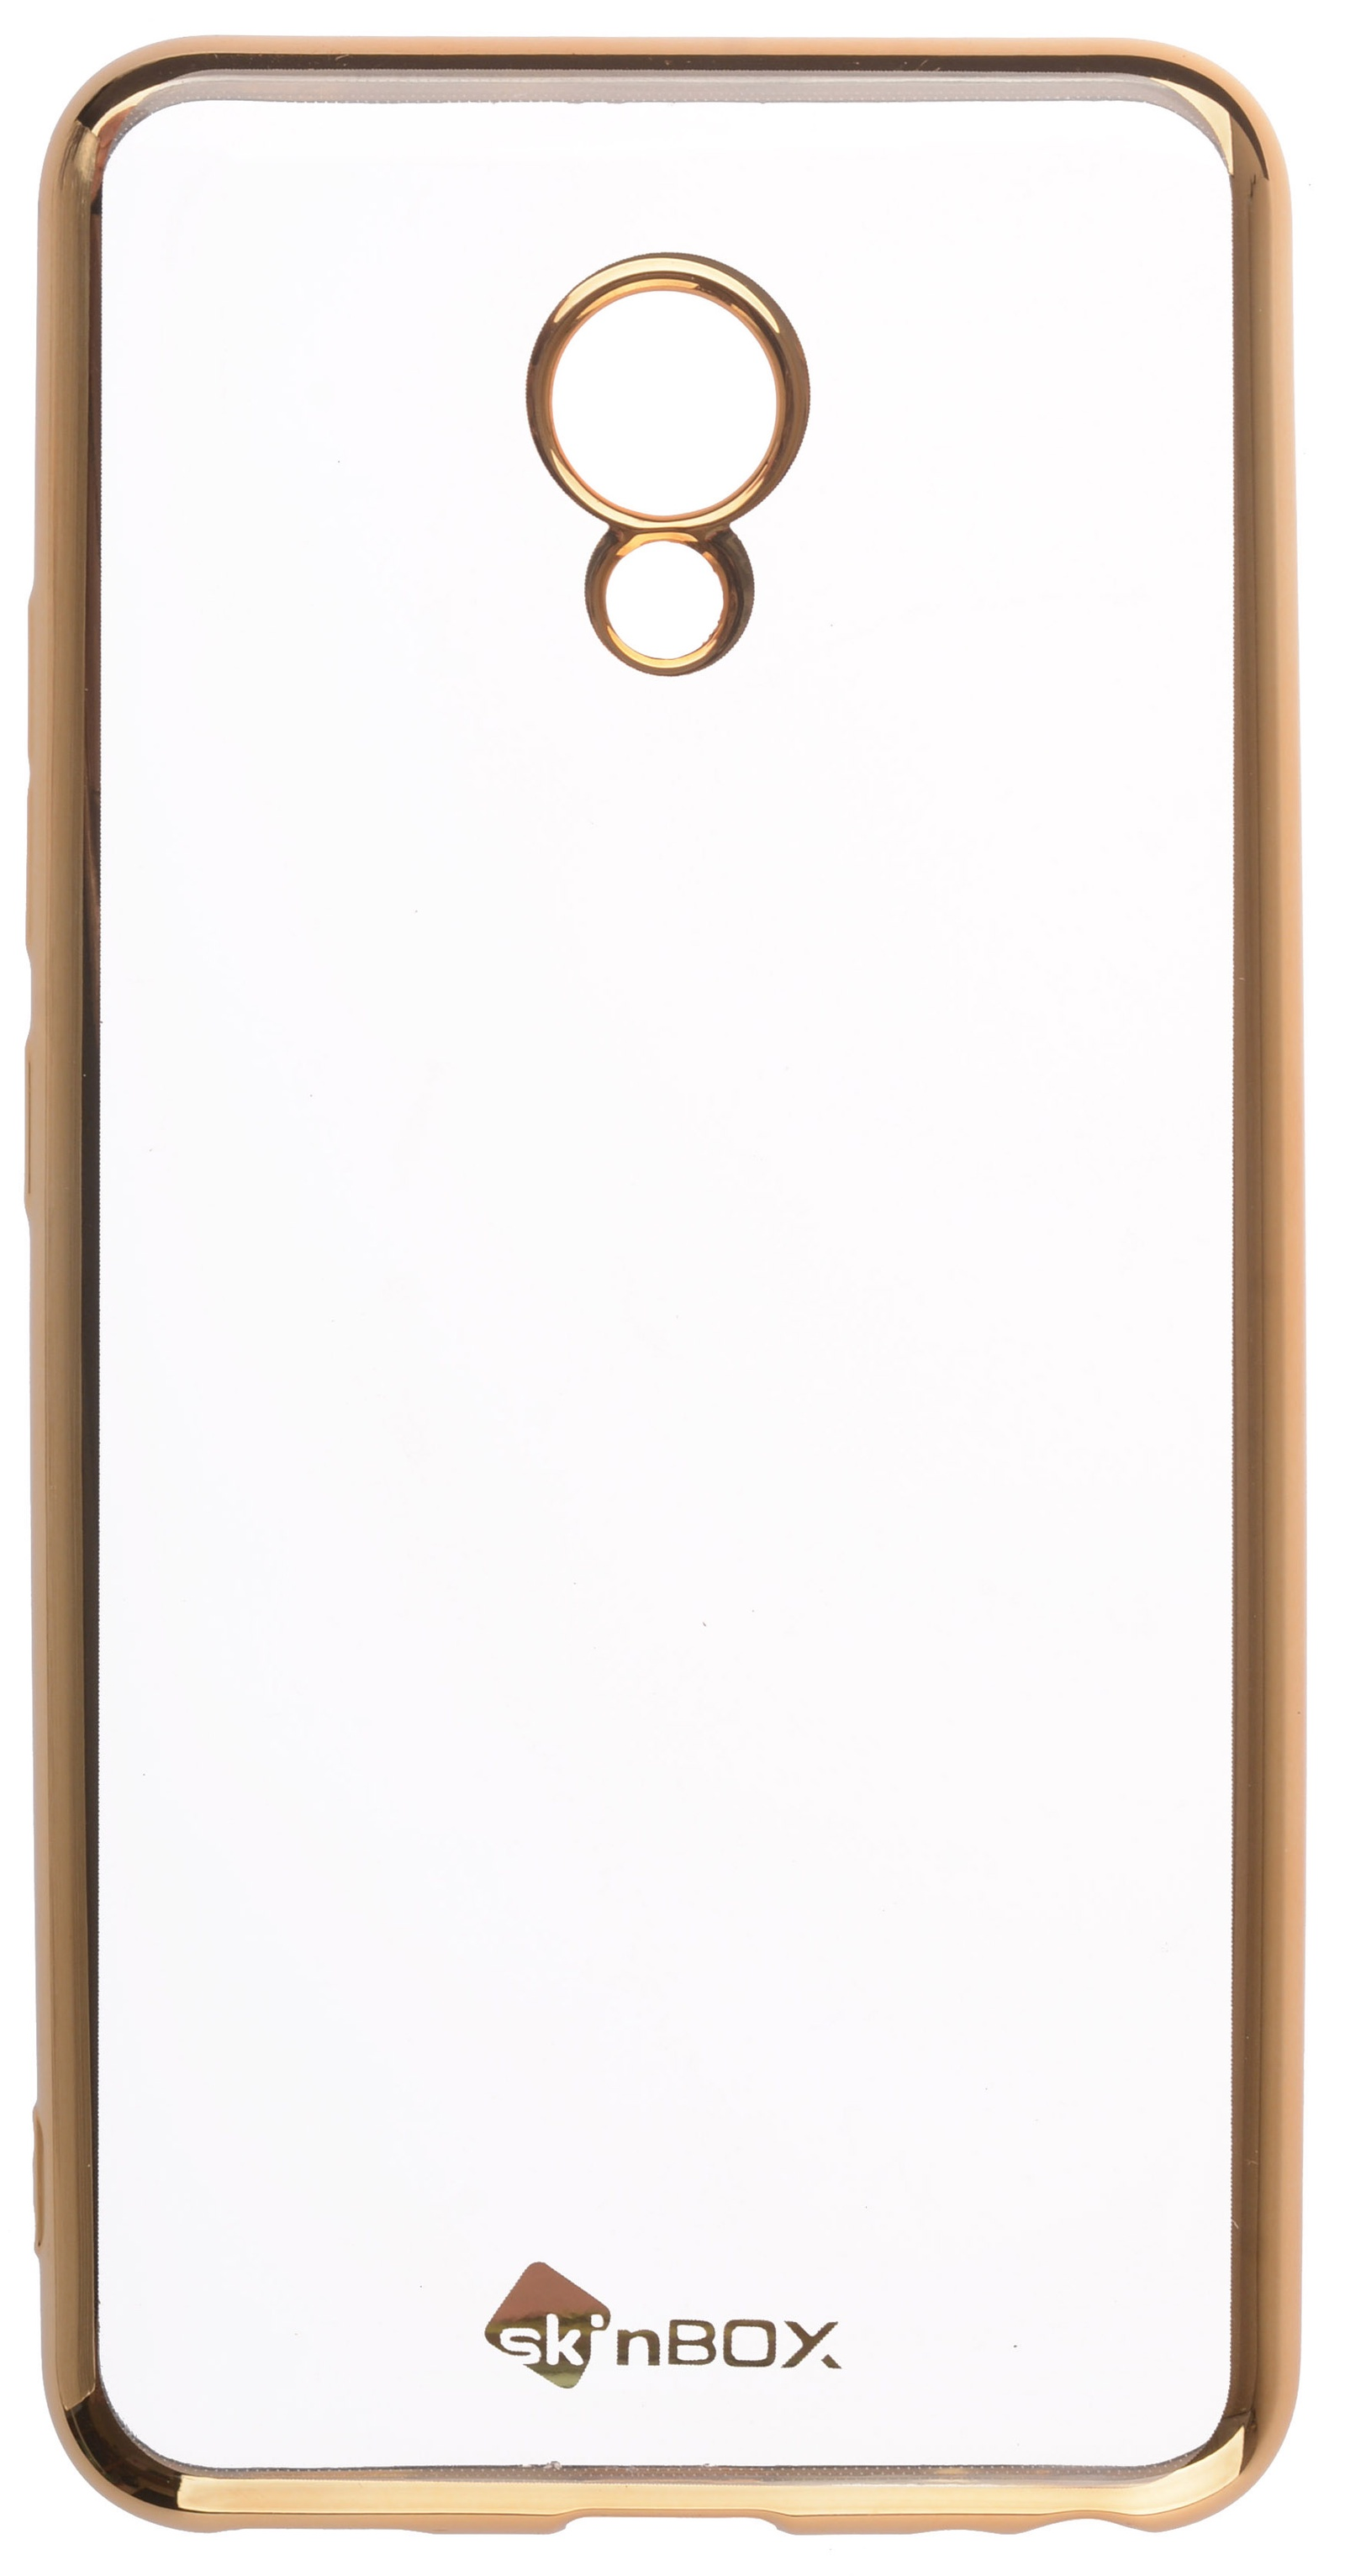 Чехол для сотового телефона skinBOX Silicone chrome border, 4630042529502, золотой аксессуар чехол накладка innovation silicone 0 33mm для apple iphone 5 5s transparent 12001